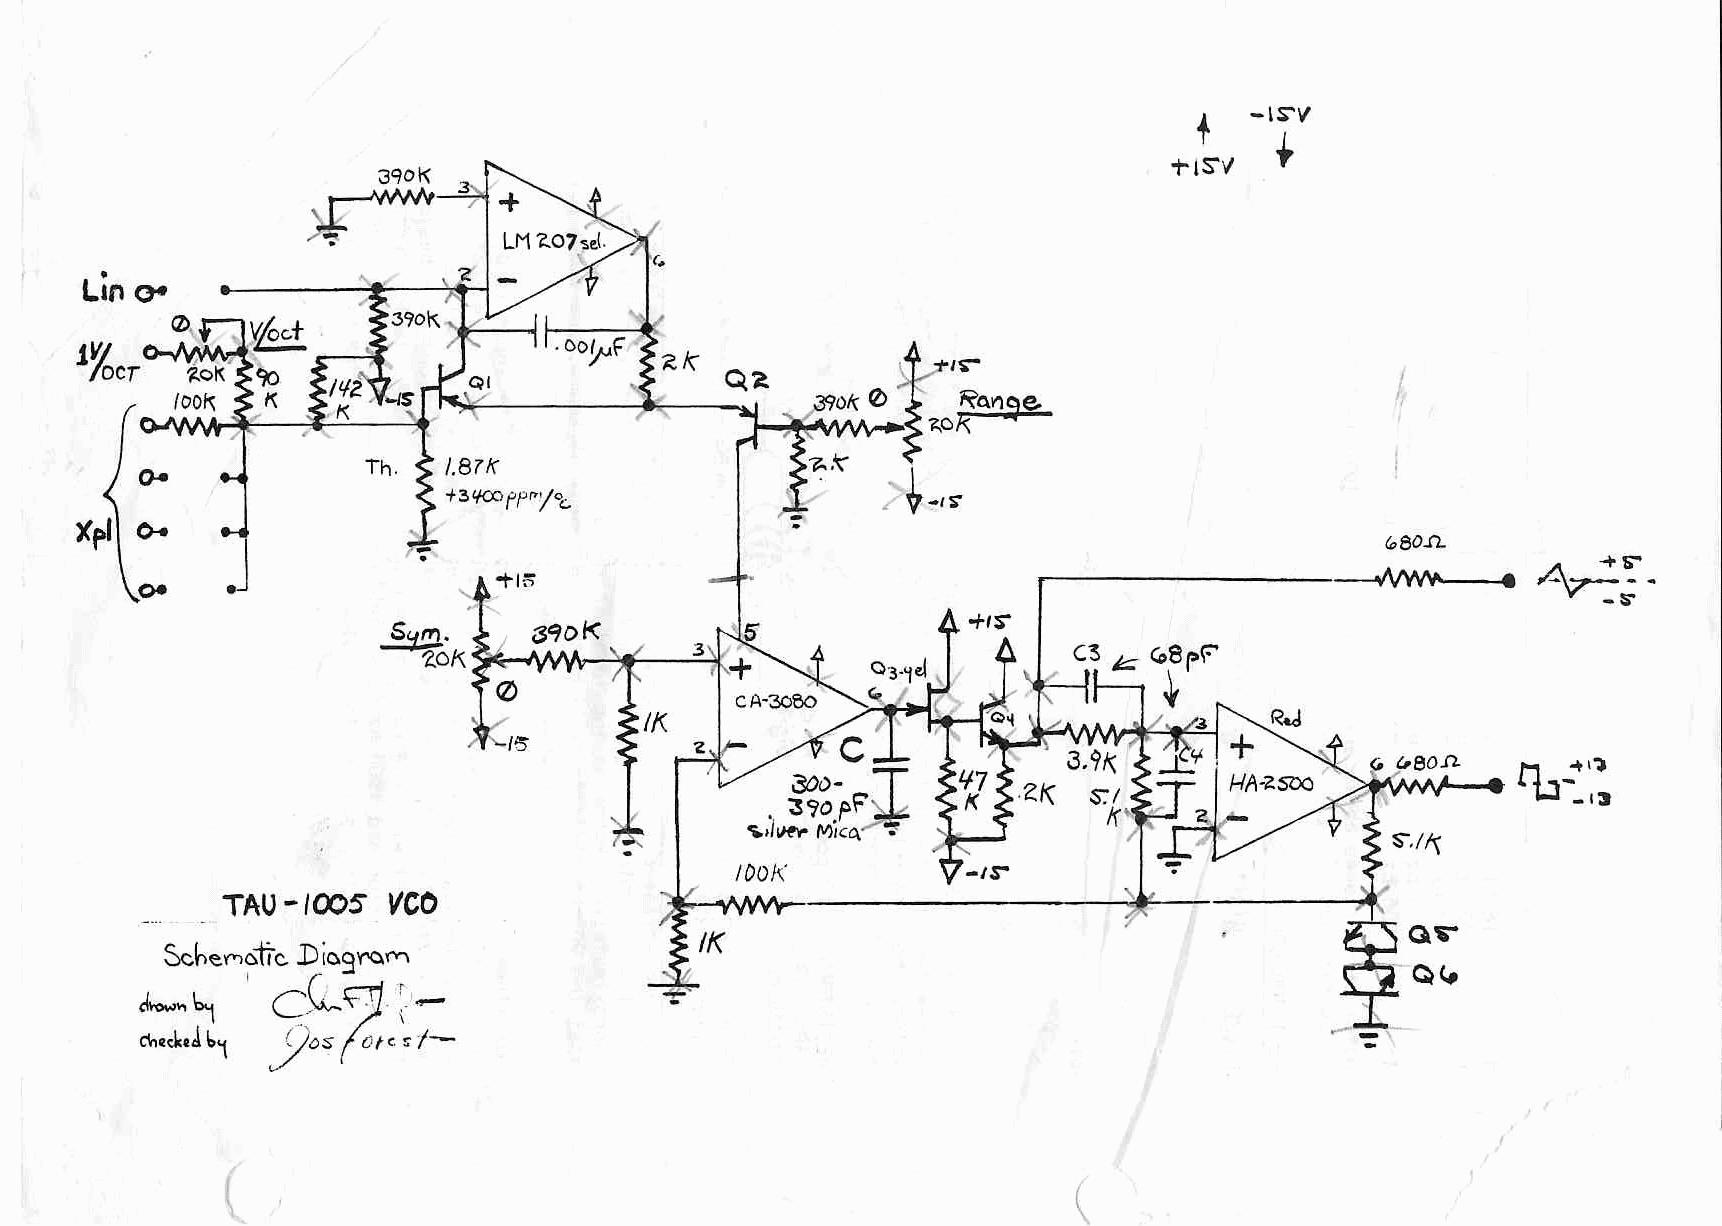 Wiki Schematics Tau 1005 Vco Circuit Diagram